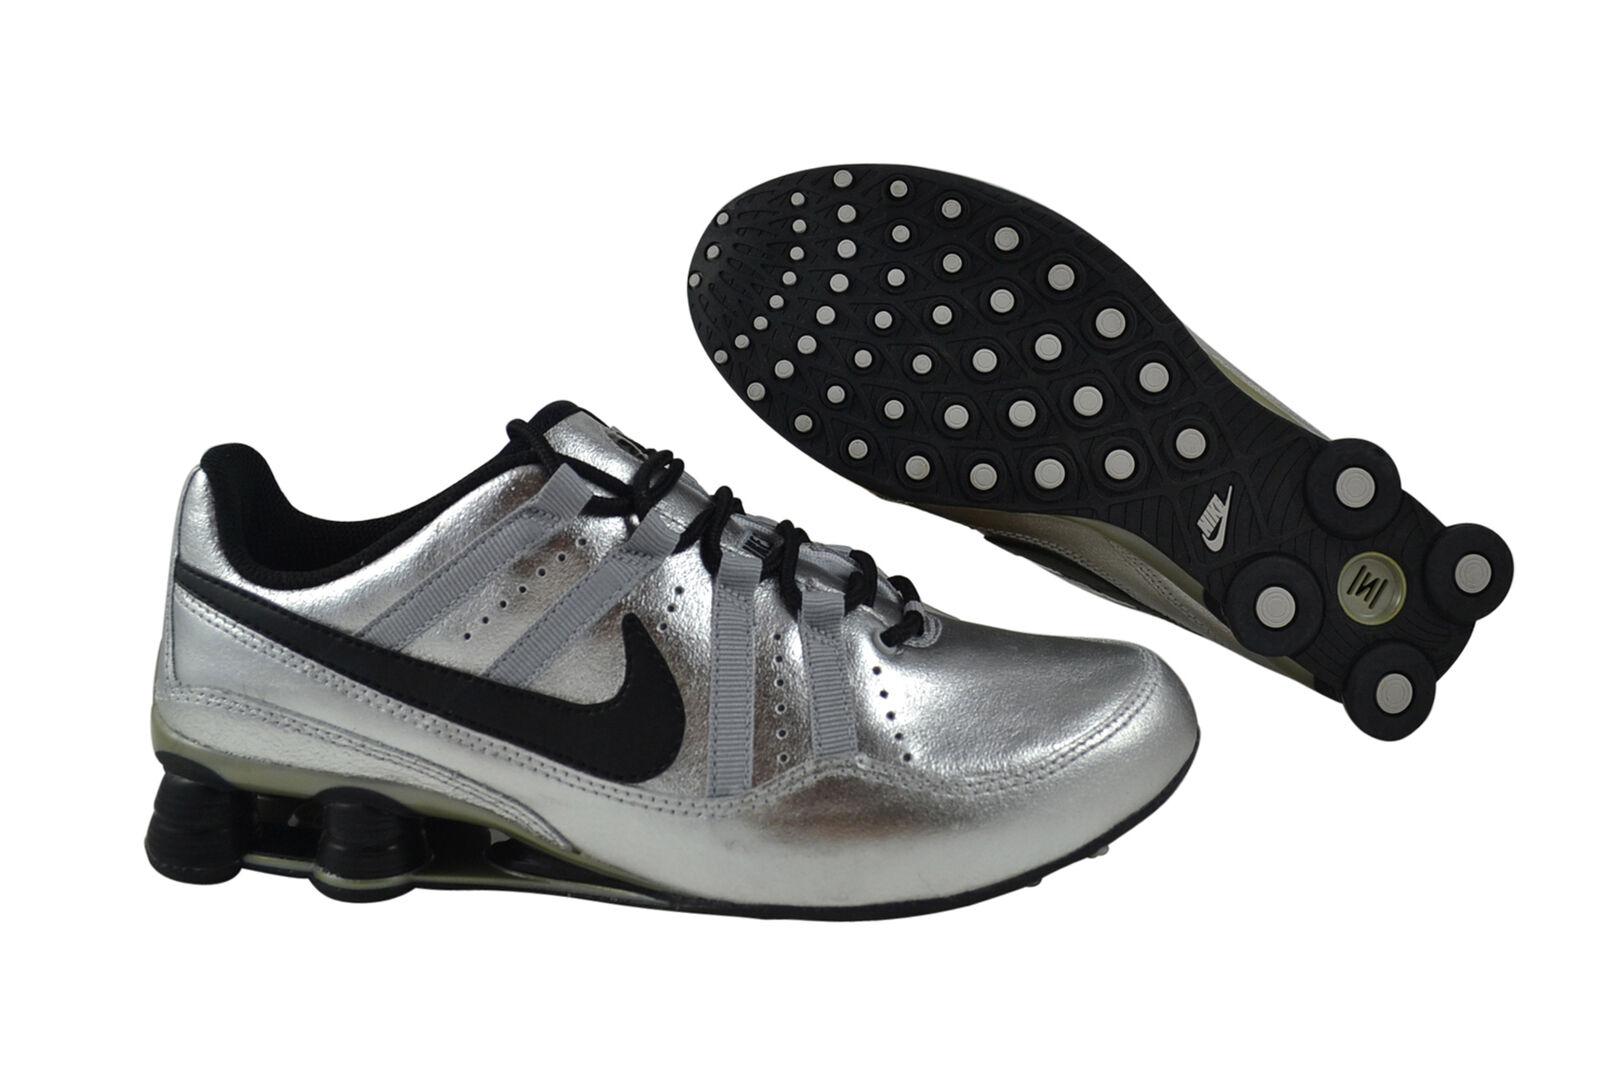 Nike Shock Beule metallic silver black Sneaker silber 316092 002